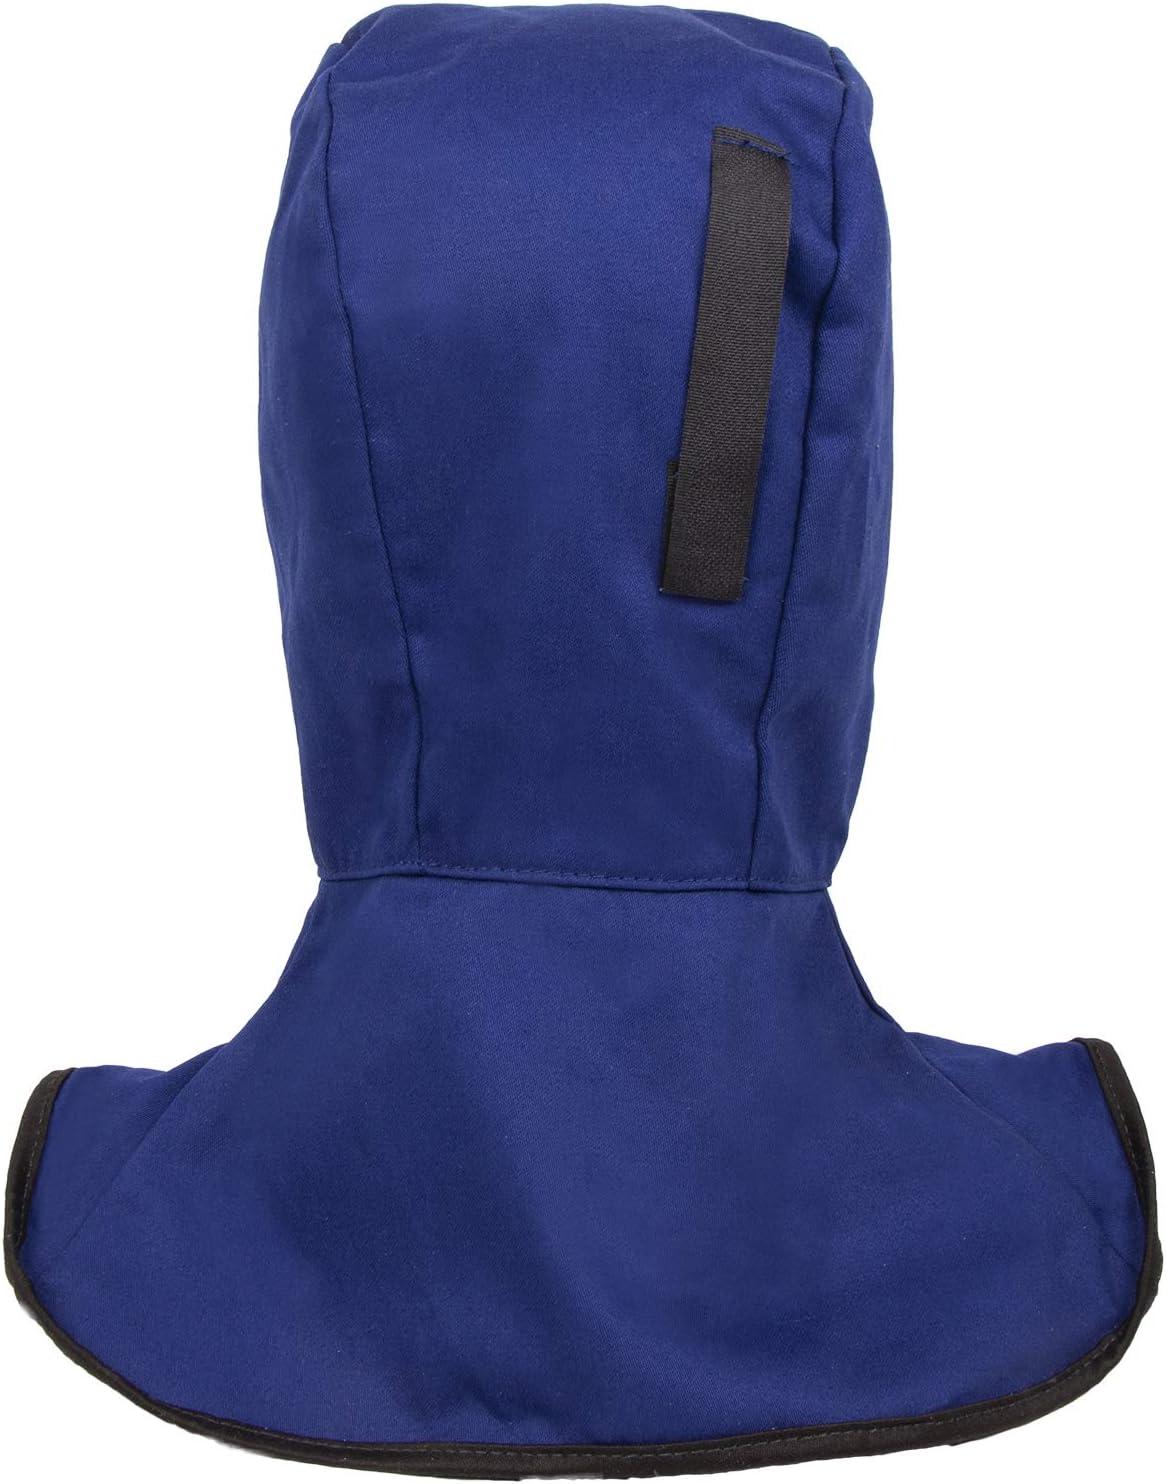 Welding Caps YESWELDER Blue Flame Retardant Full Protective Welding Hood with Neck Shoulder Drape